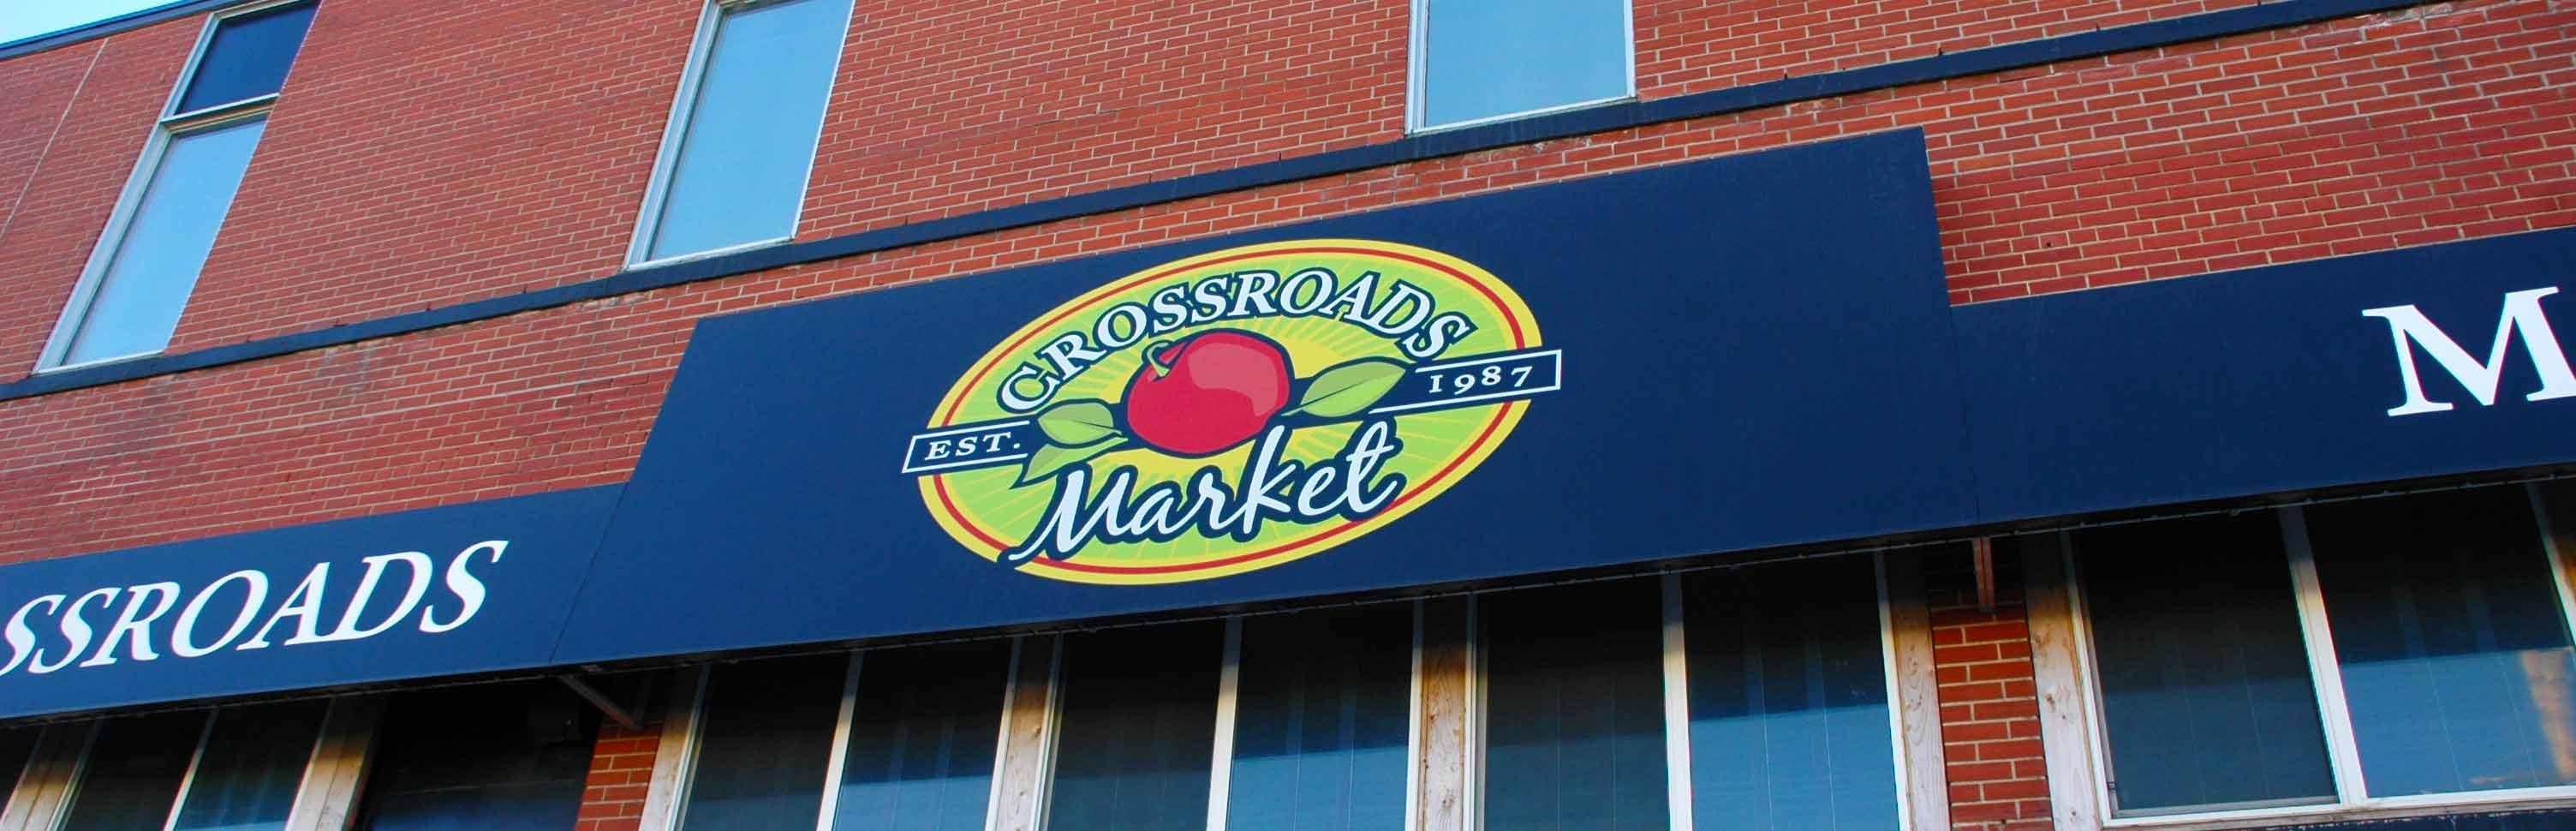 CrossRoads Market Custom Banner